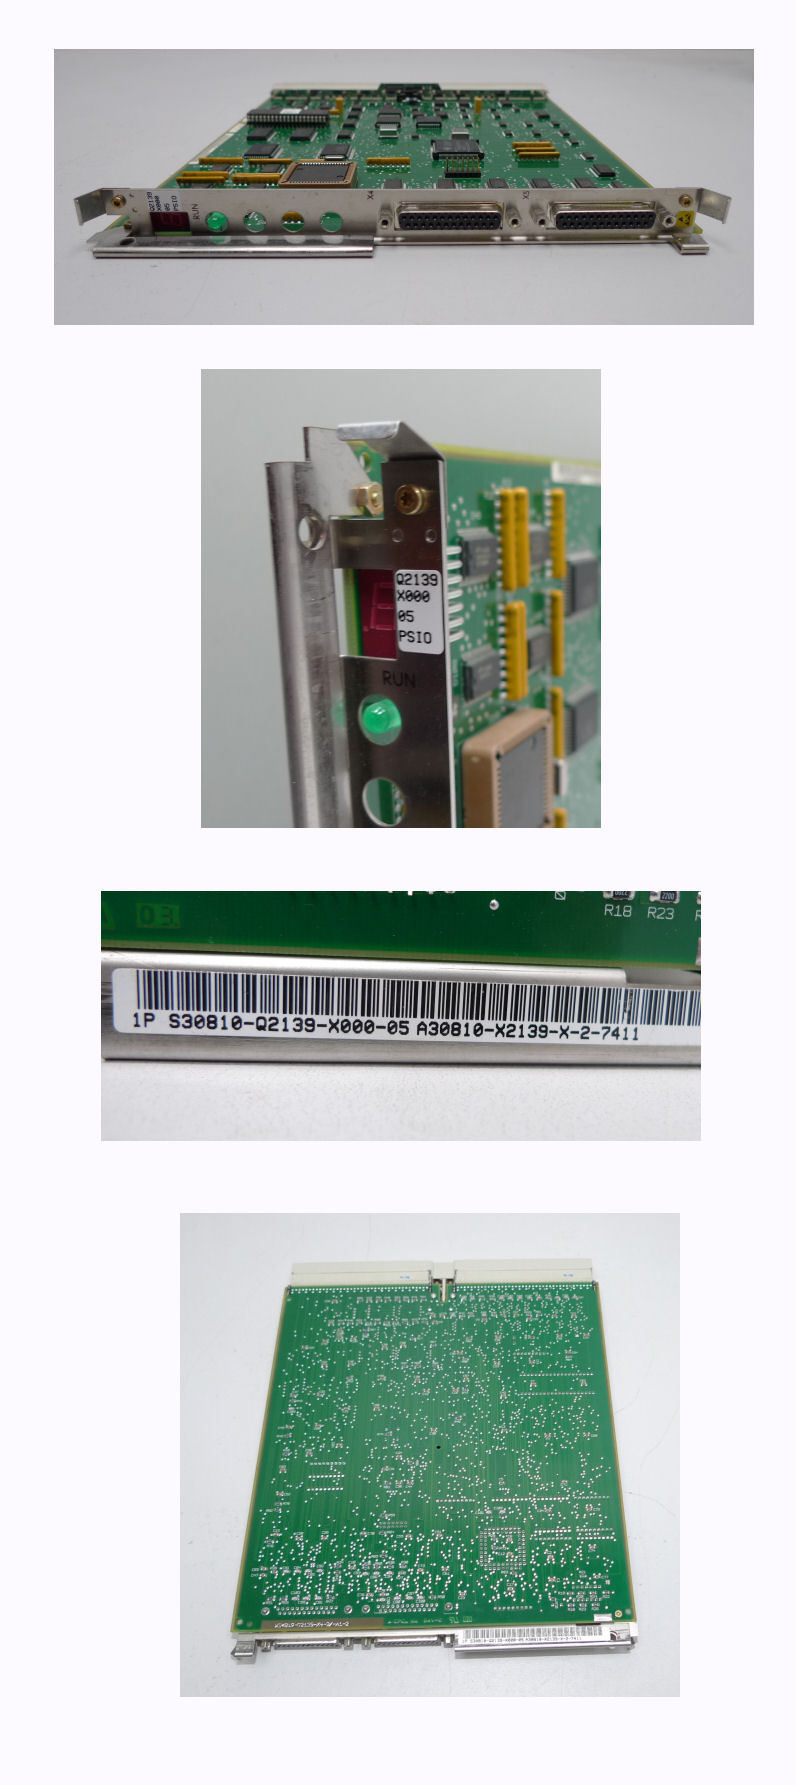 Siemens Hicom S30810-Q2139-X000 A30810-x2139